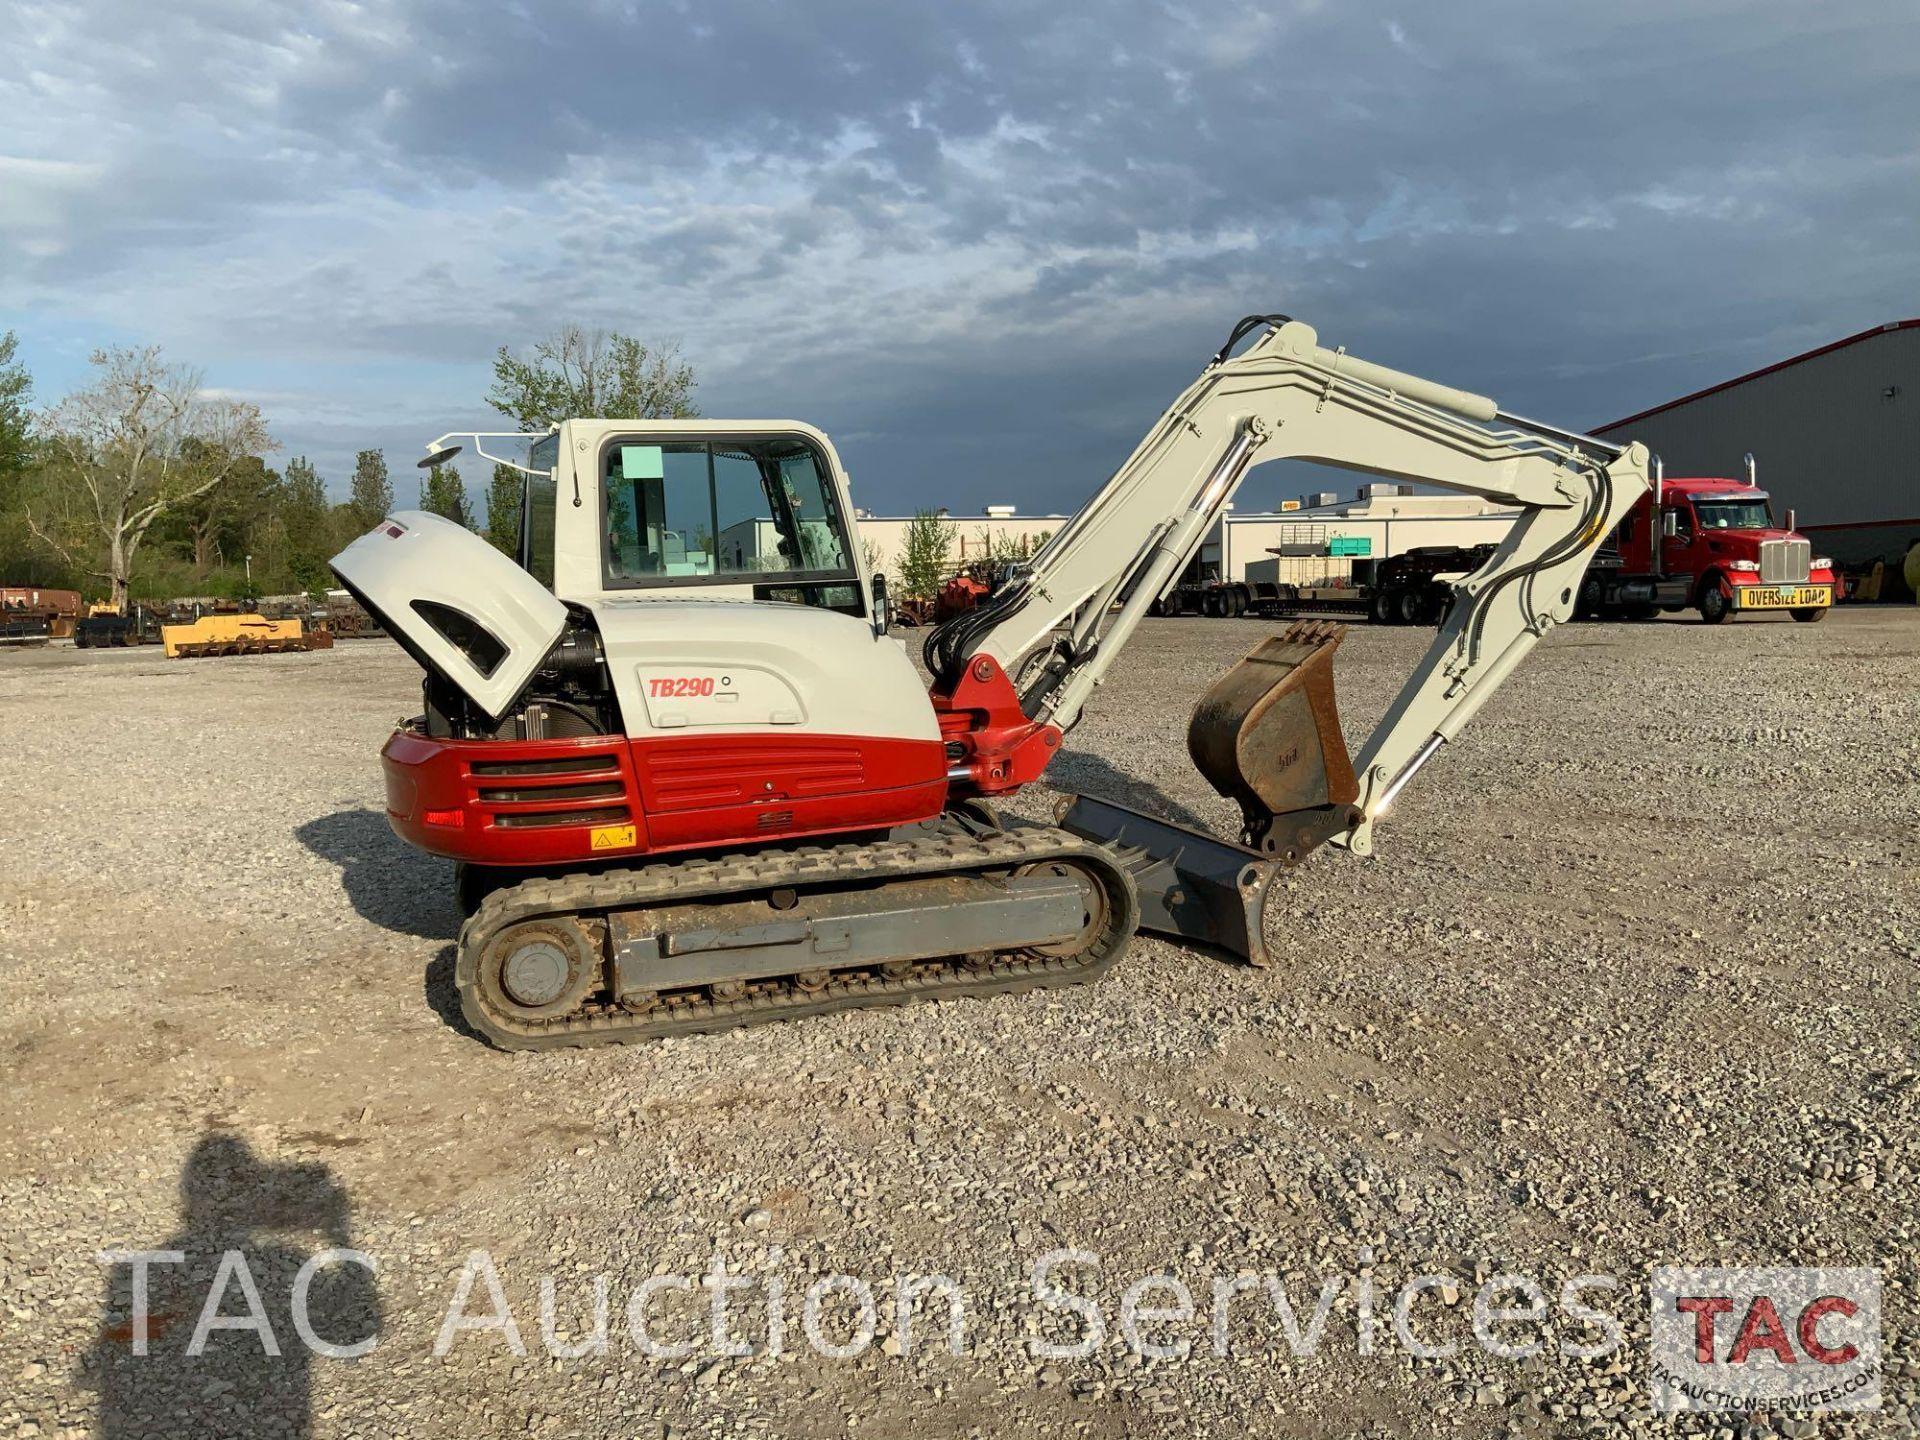 2017 Takeuchi TB290 Excavator - Image 12 of 45